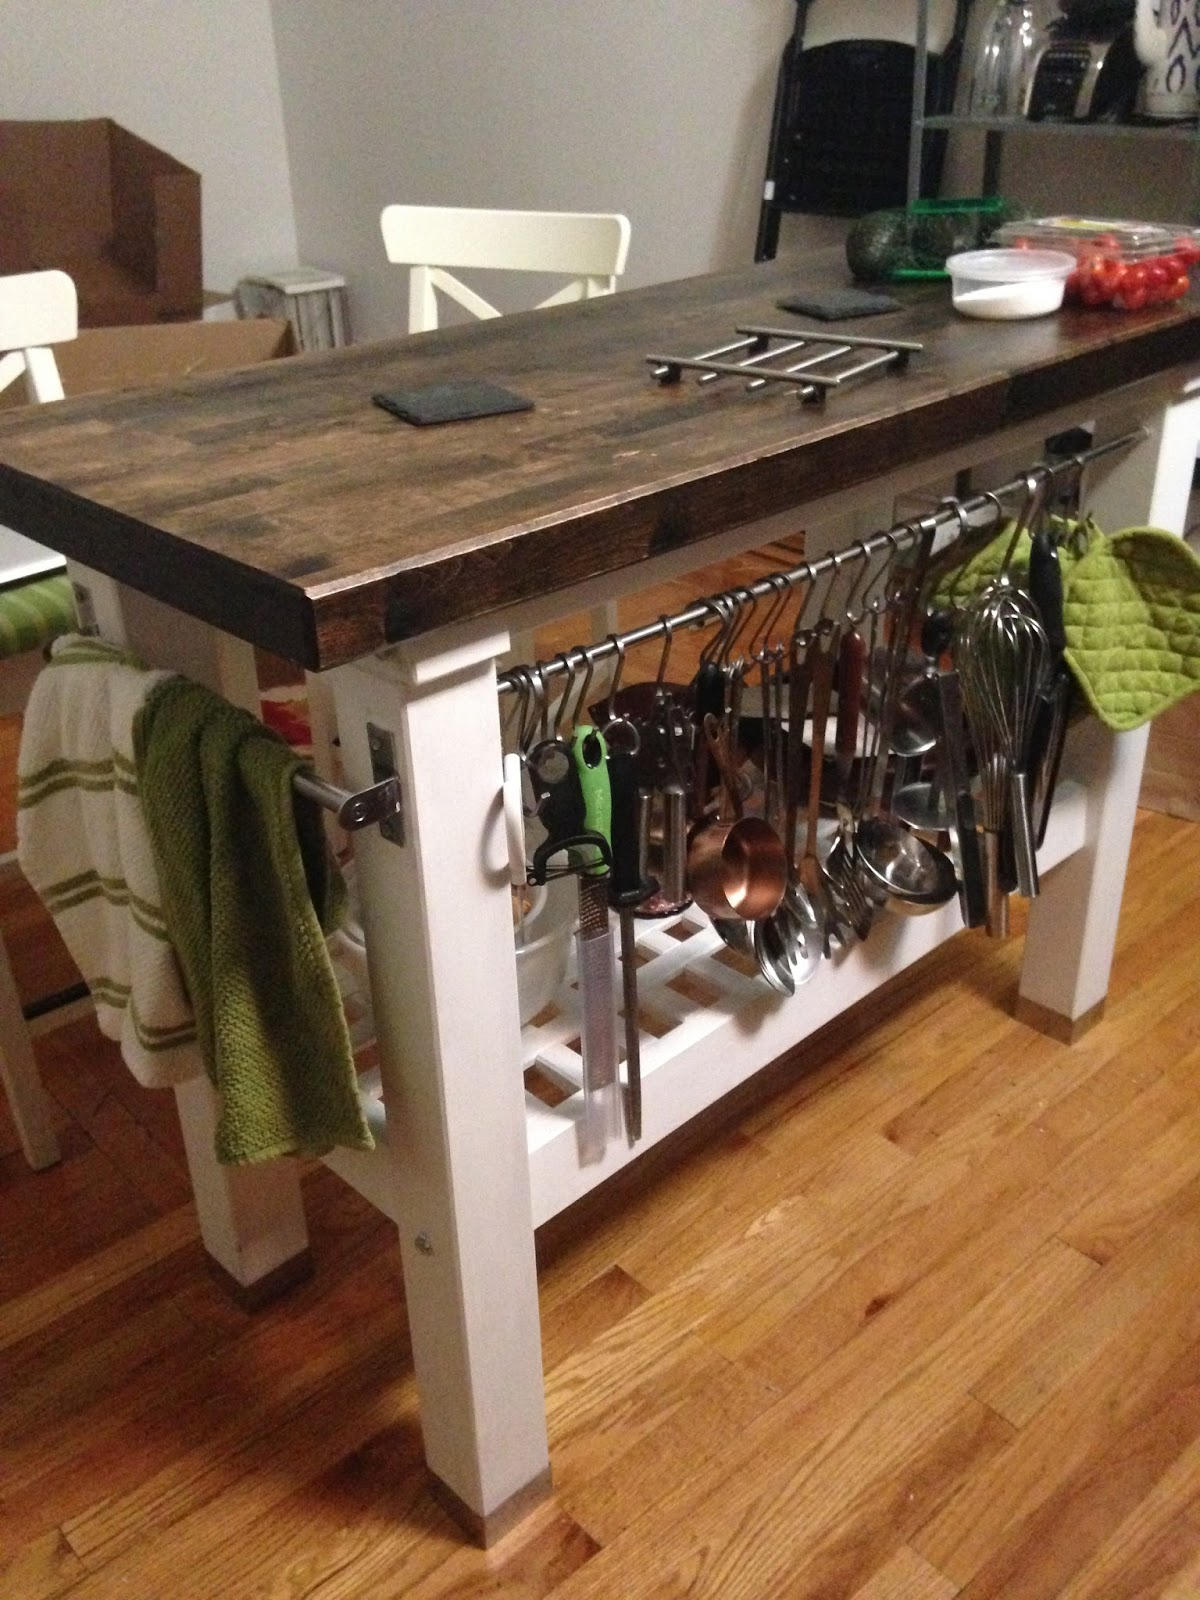 kitchen island bar stools ninja mega system 1500 recipes bake and baste: how to stain finish a rustic ...